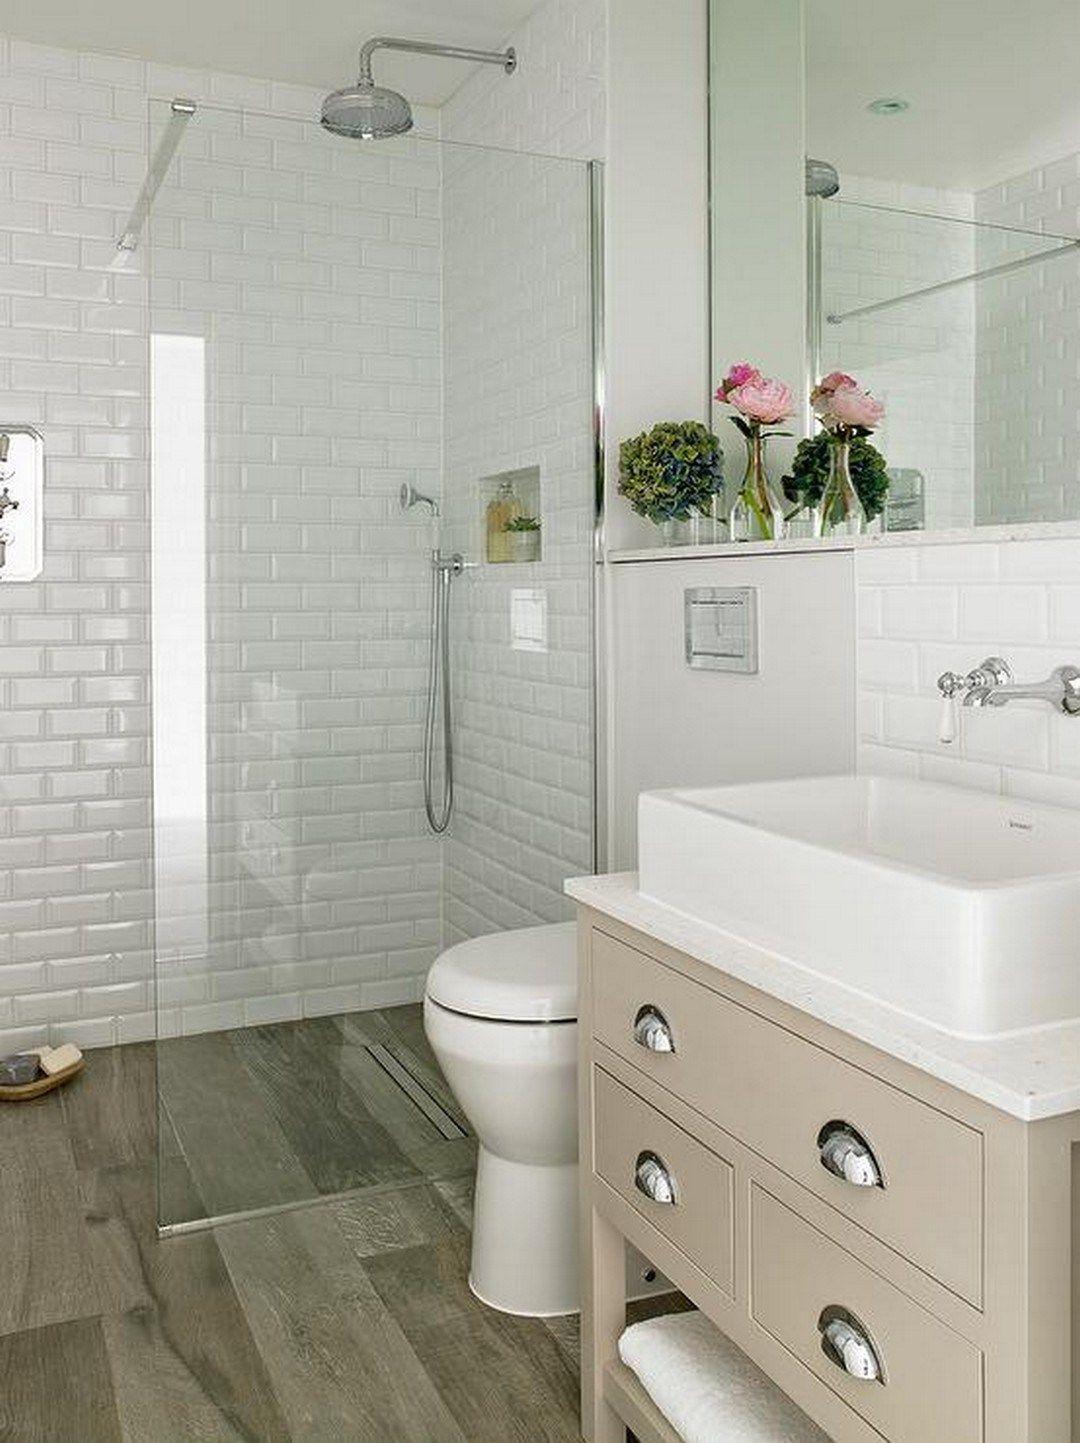 99 Small Master Bathroom Makeover Ideas On A Budget (56 ... on Small Bathroom Ideas Pinterest id=92338